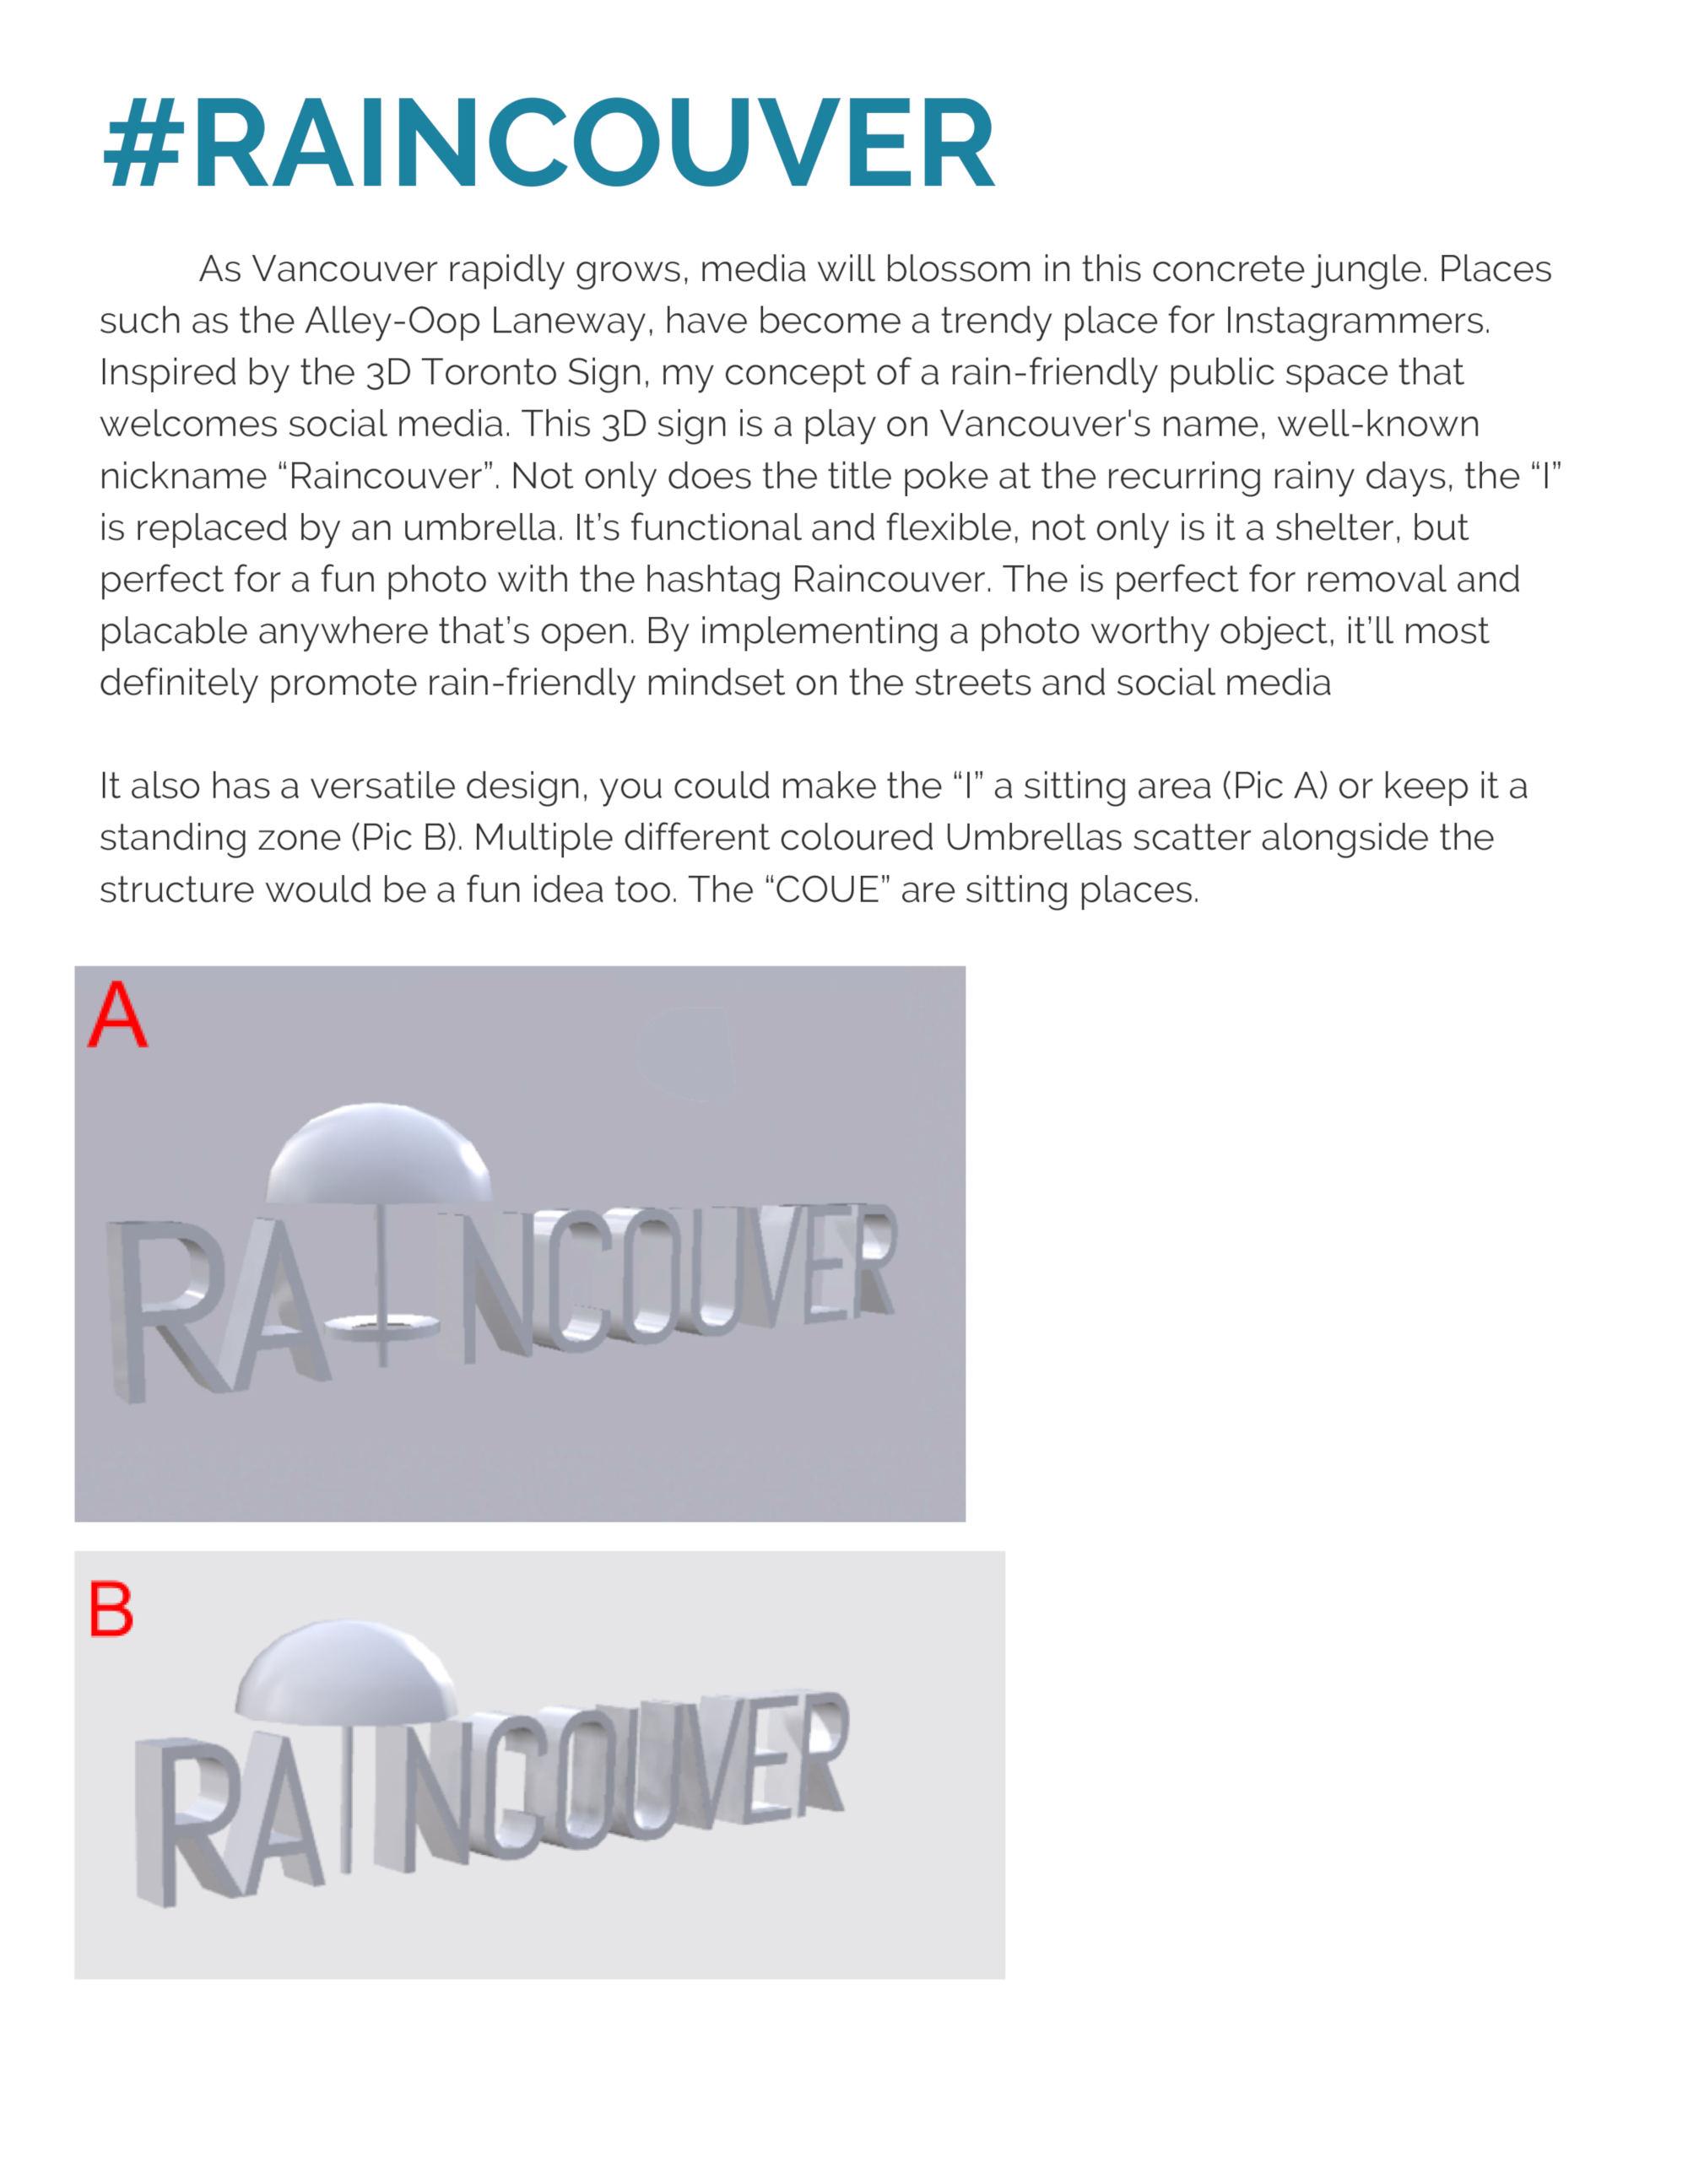 B11 - RAINCOUVER 3 - 8.jpg